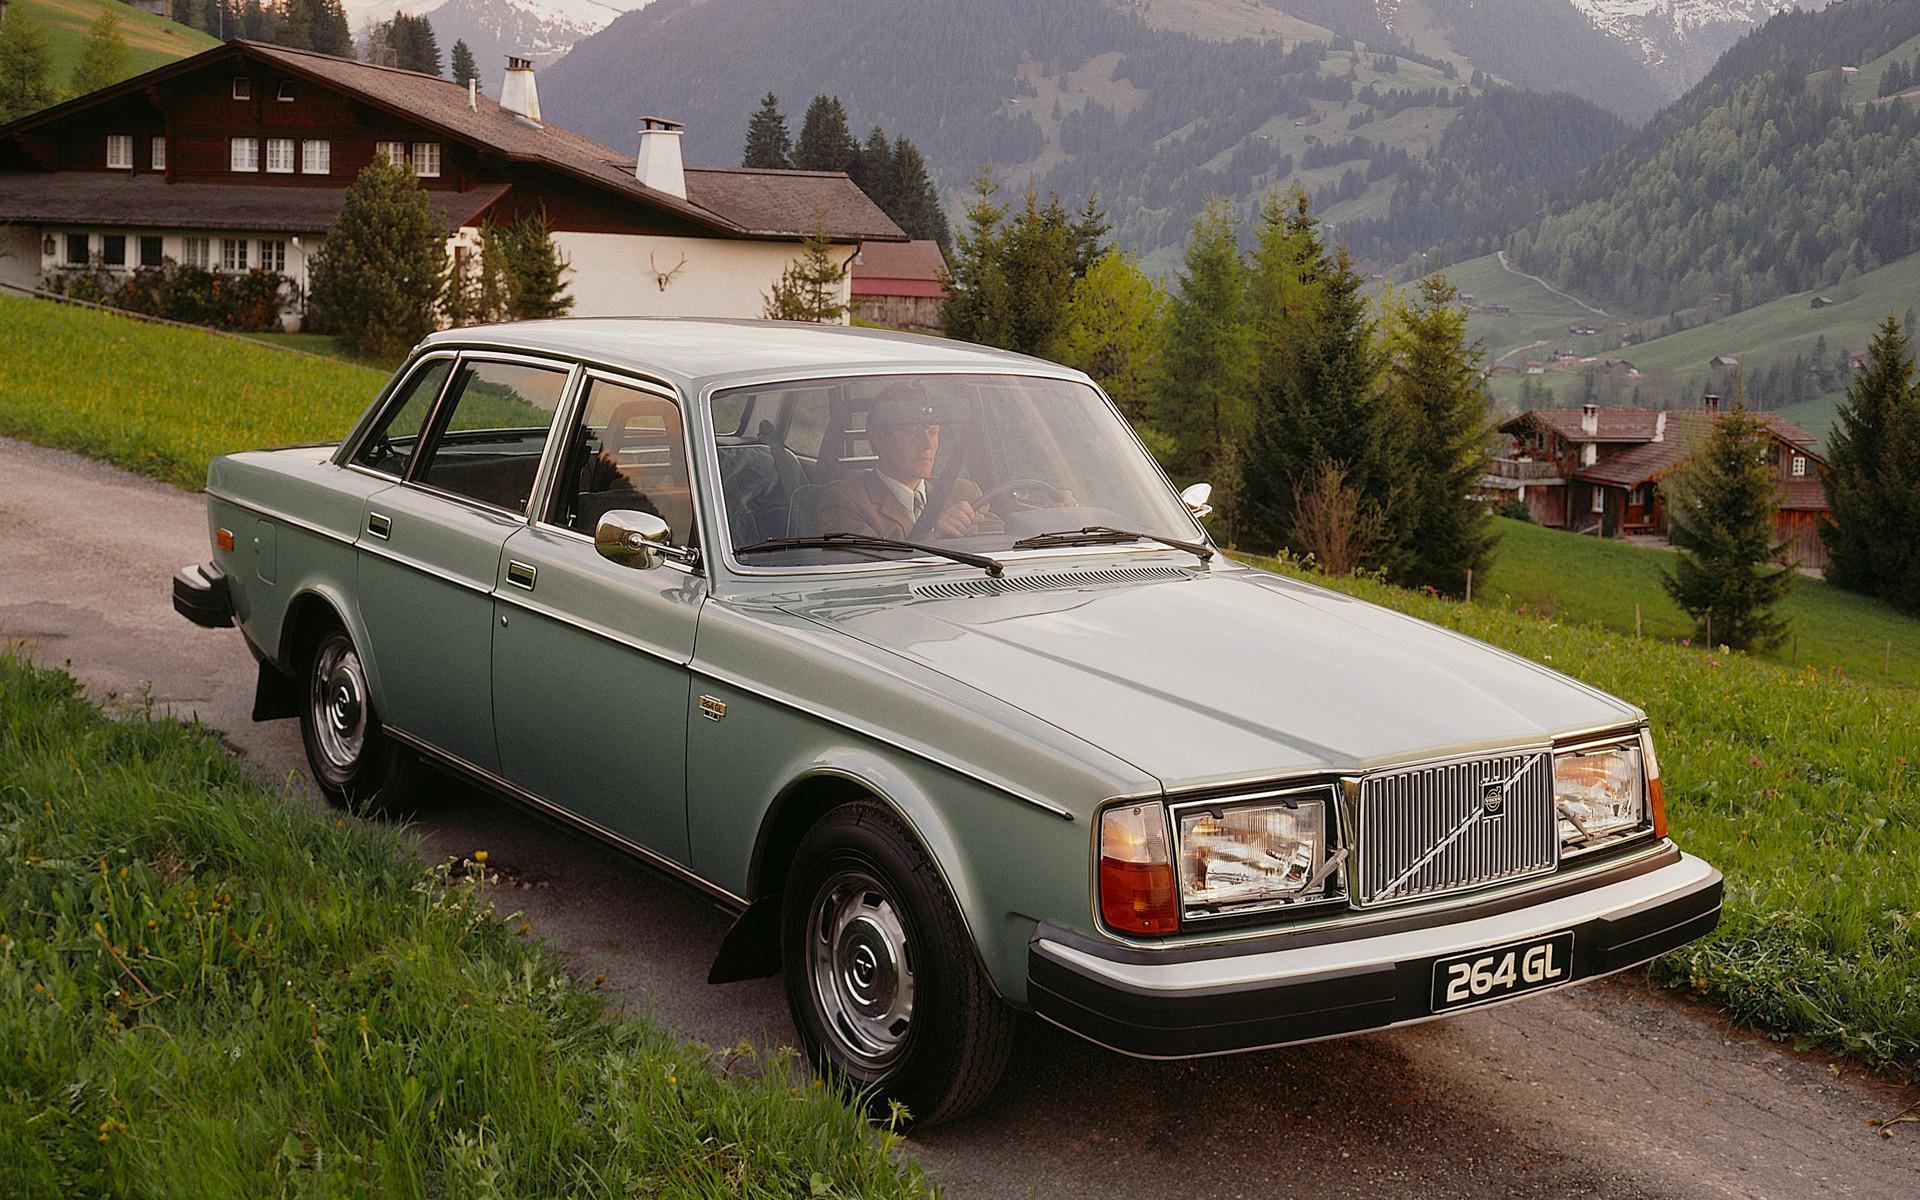 Volvo 264 GL (Ist)